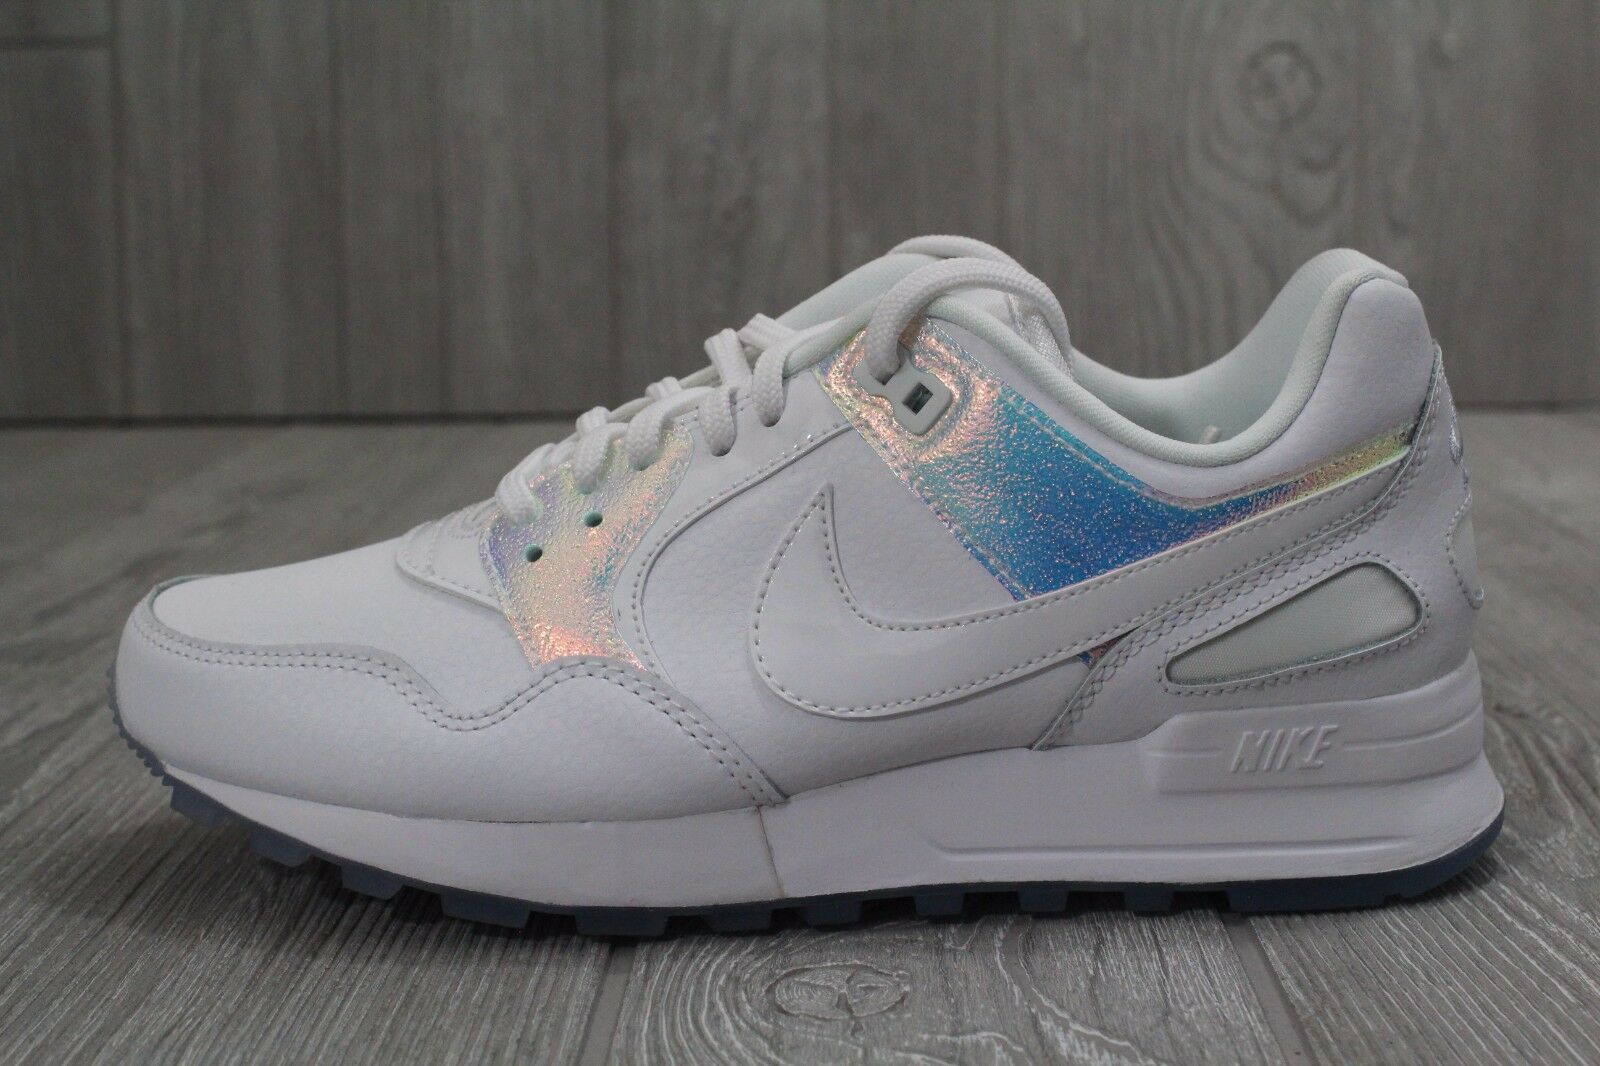 23 New Women's Nike Air Pegasus 89 PRM Premium White Shoes 844889-100 SZ 6-9